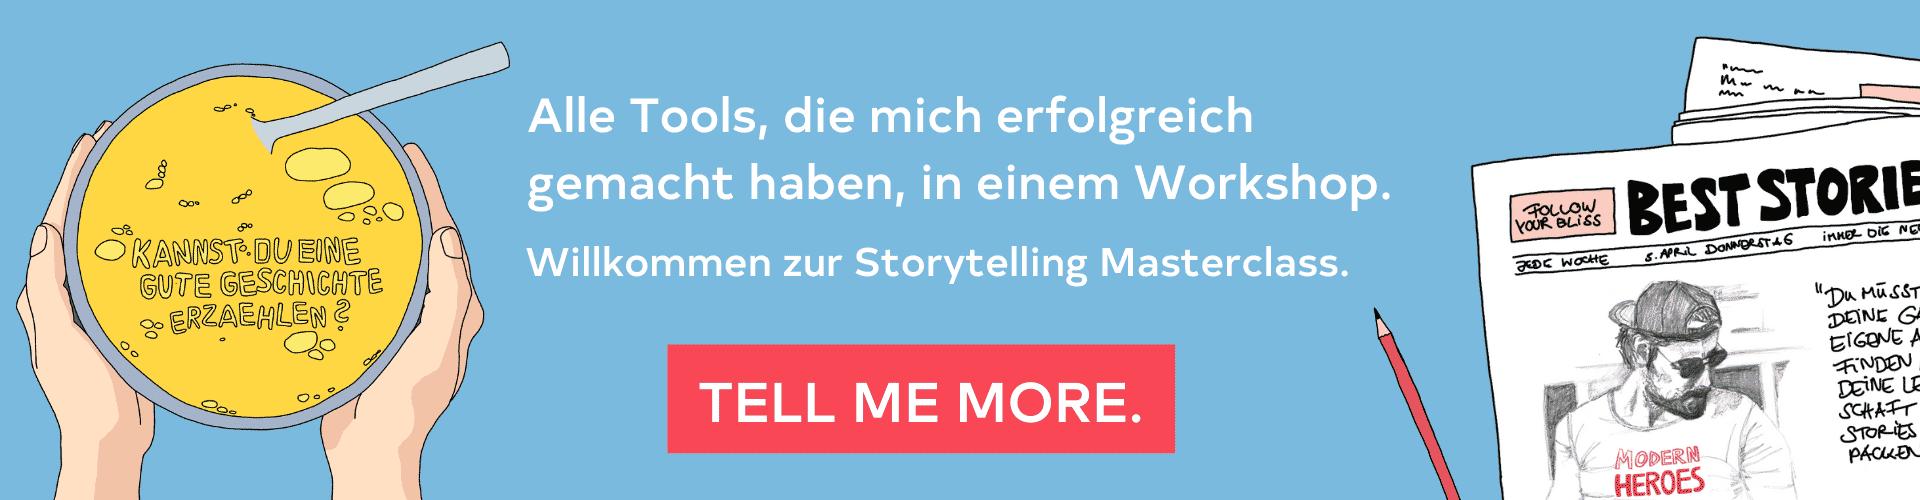 Storytelling Masterclass Uwe Walter